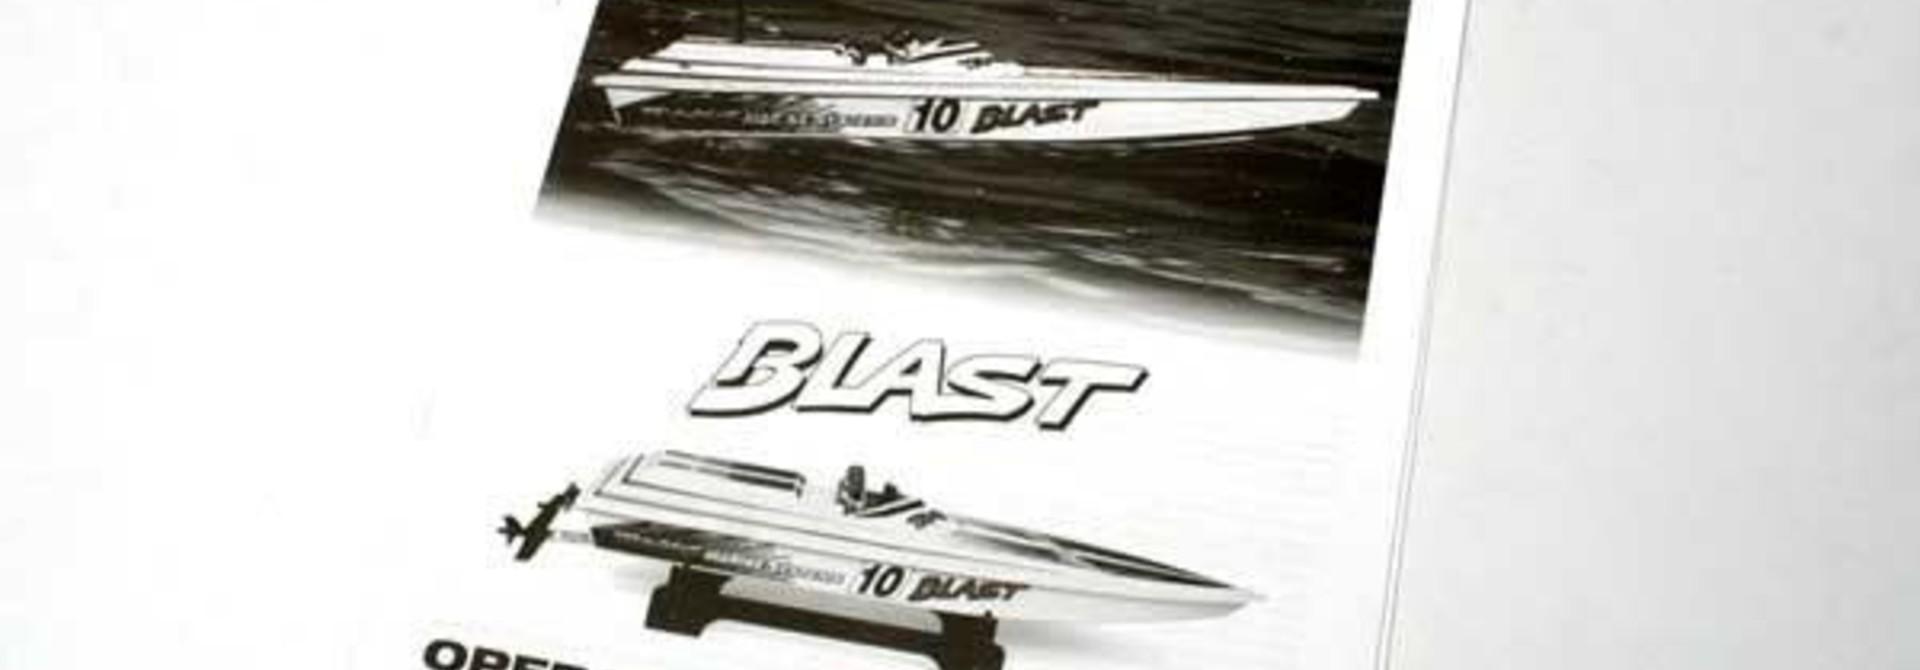 Blast Operating Manual